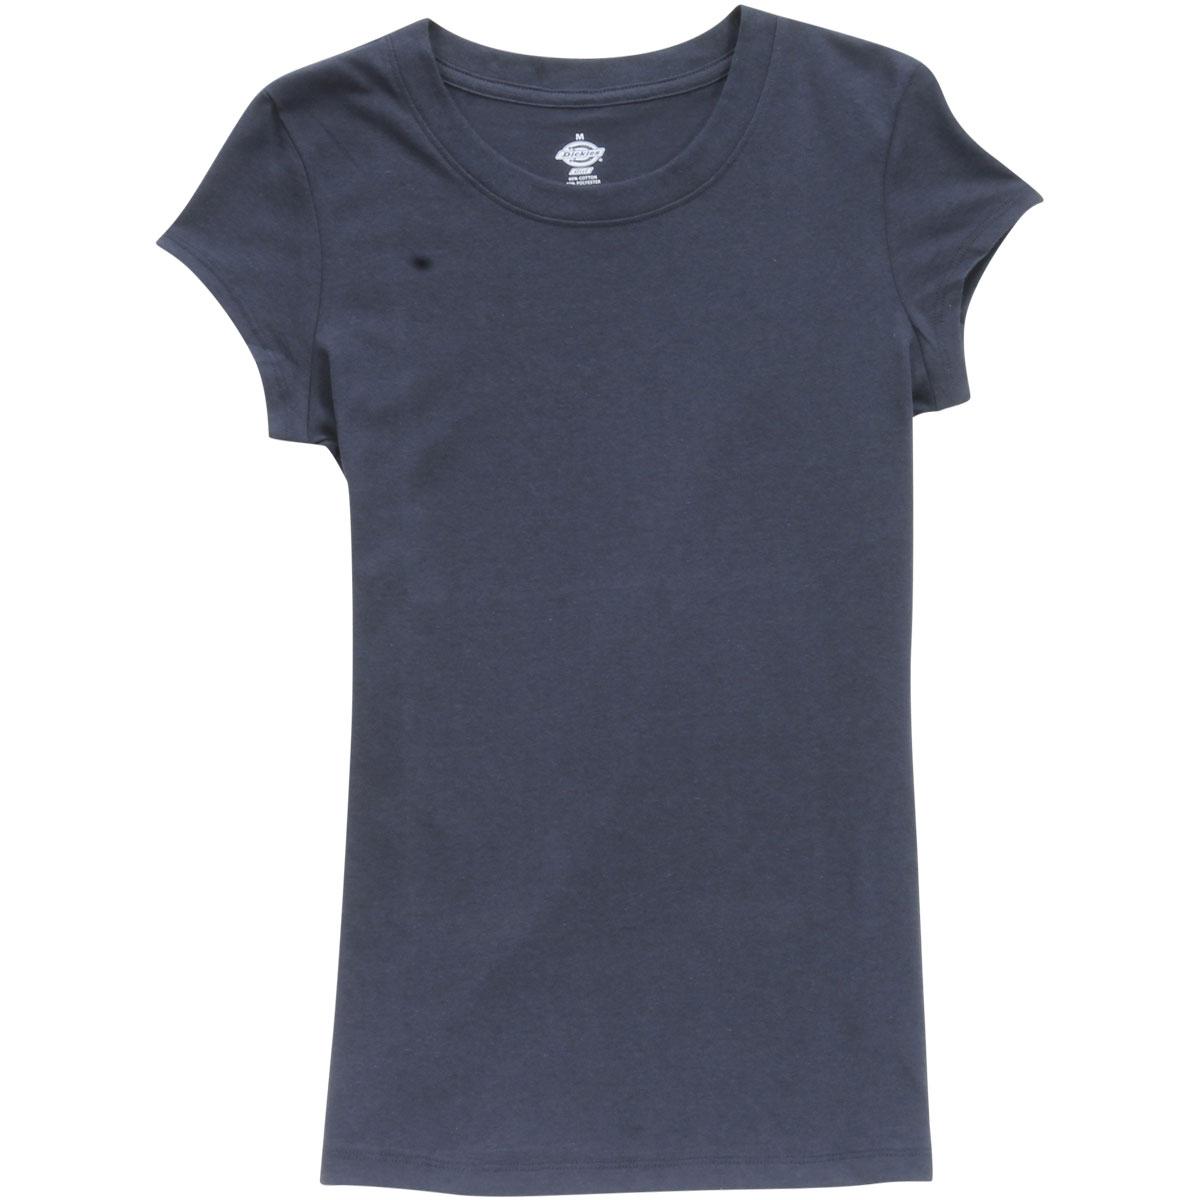 2a045748c39ef8 Dickies Girl Juniors Women s Slim Fit Short Sleeve Crew Neck T-Shirt ...